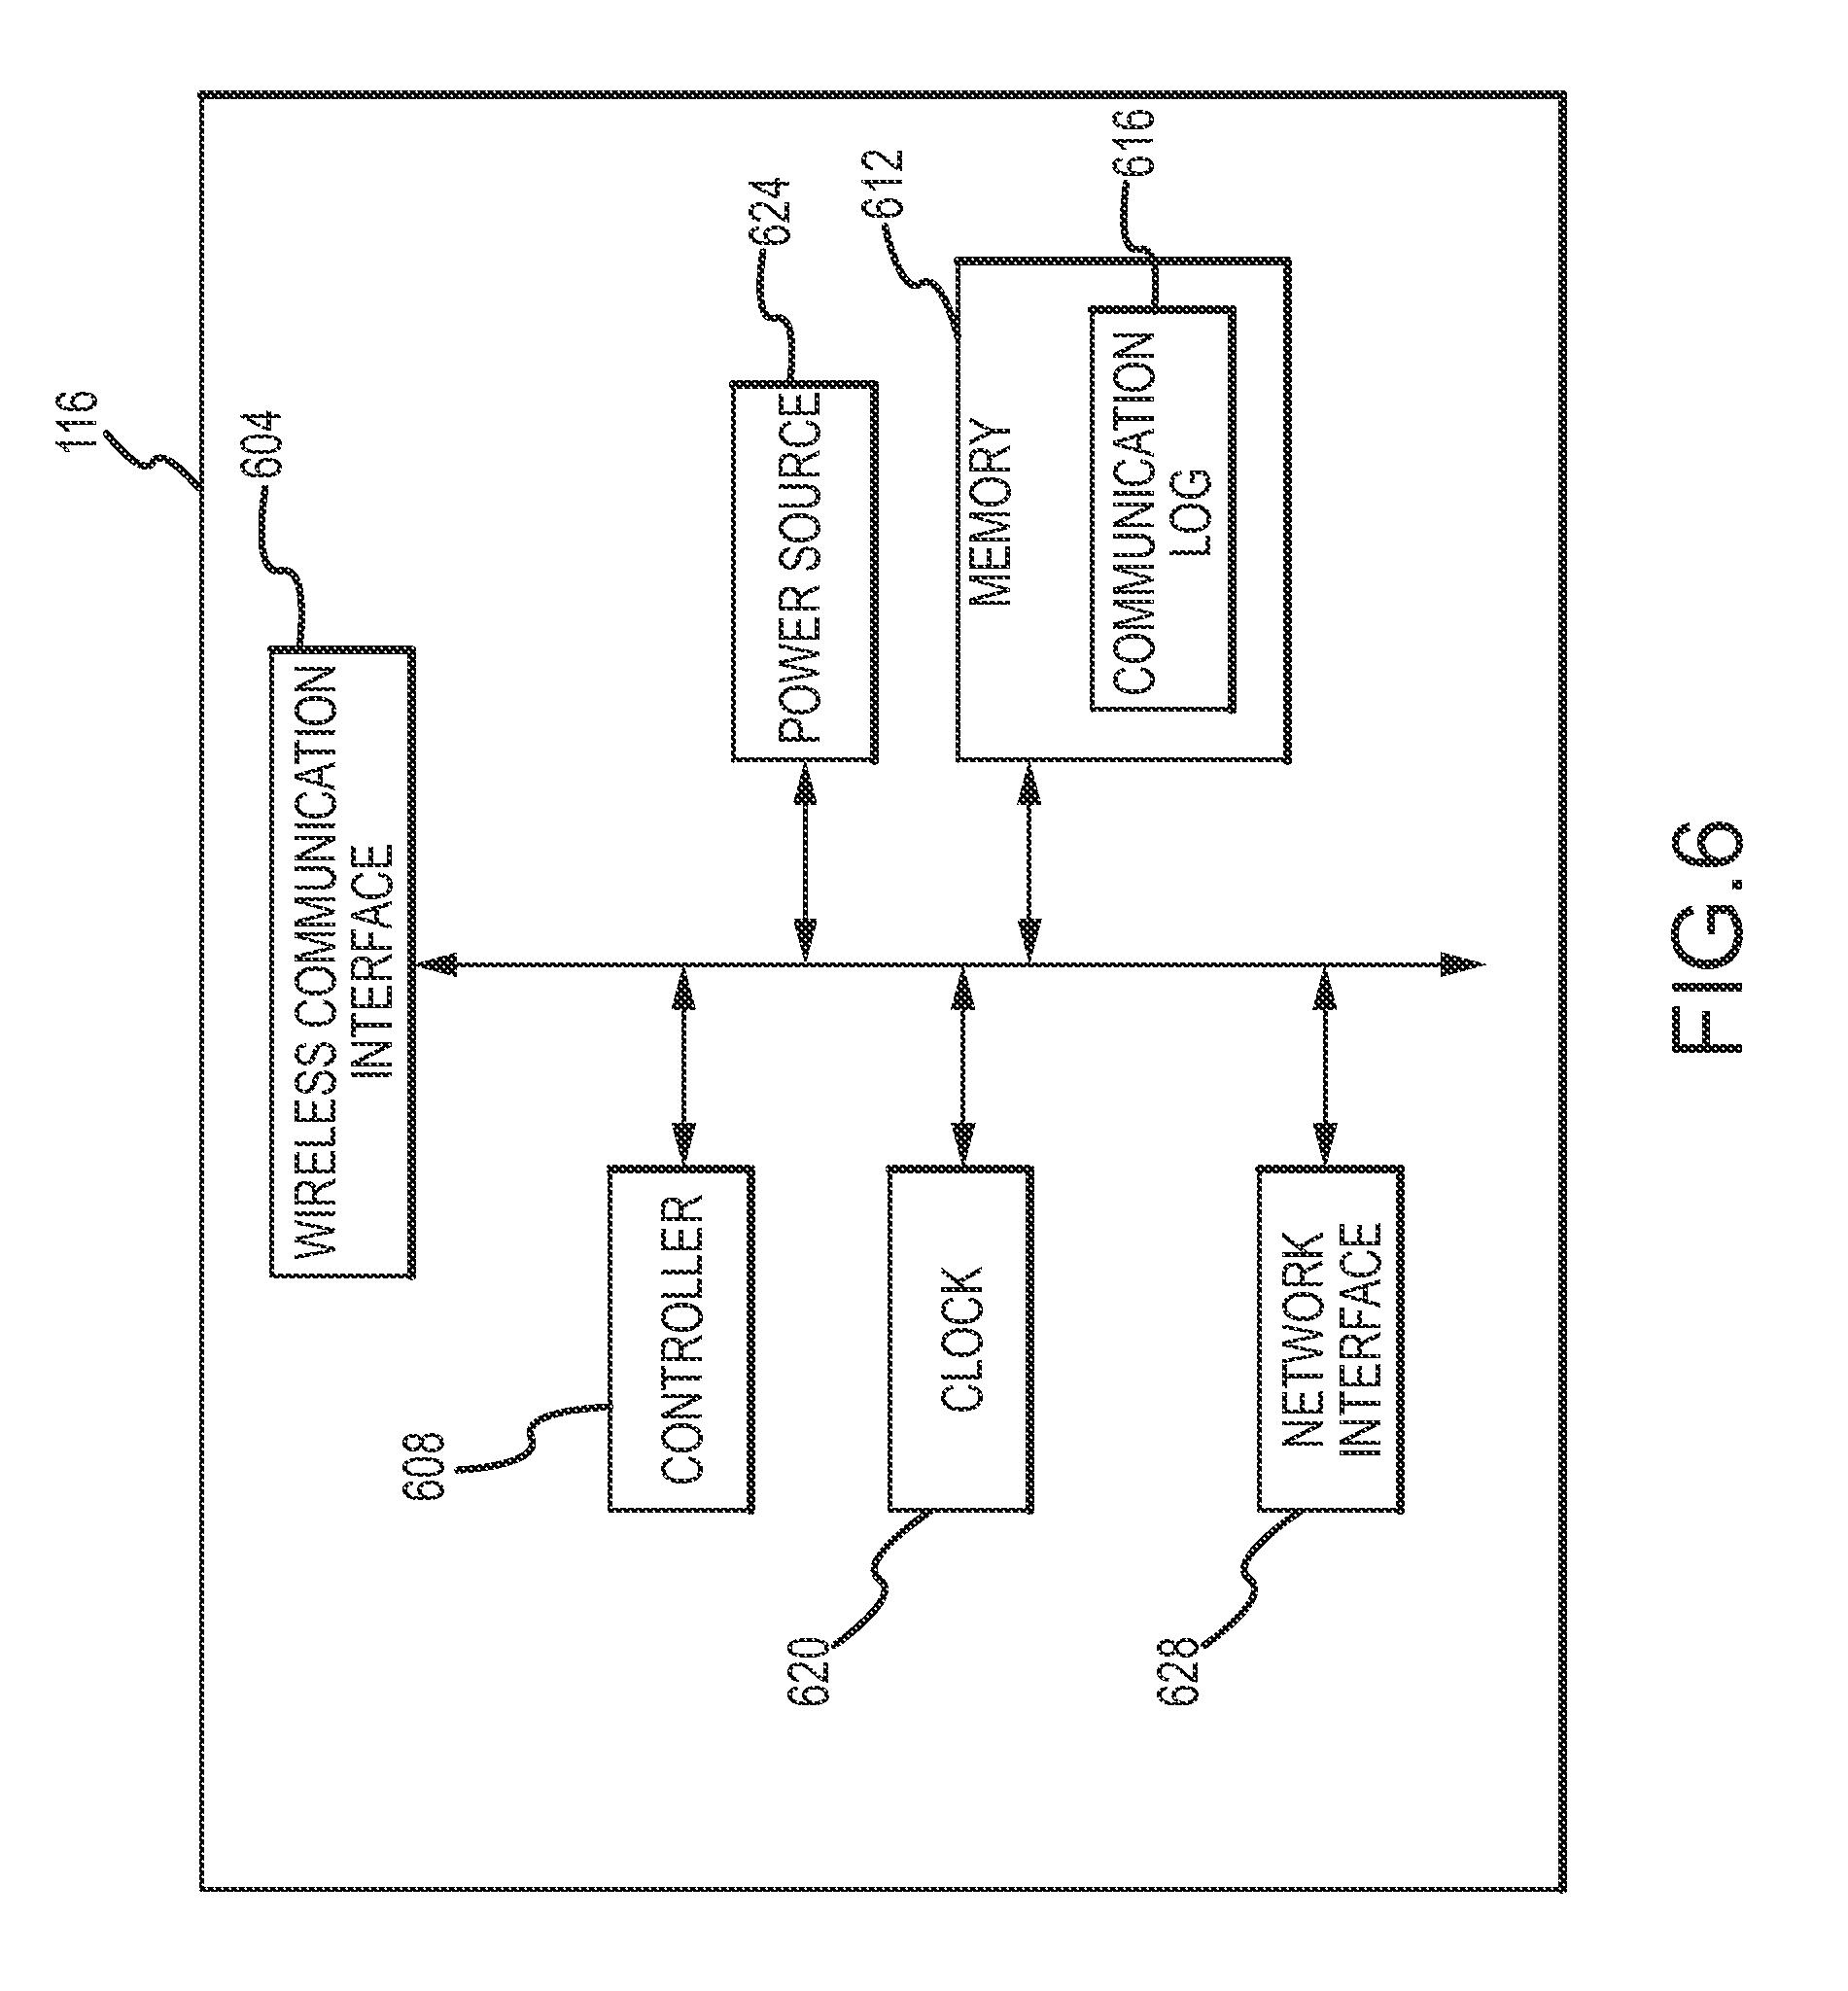 Patent Us 8102799 B2 Circuit Diagram Wireless Fidelity